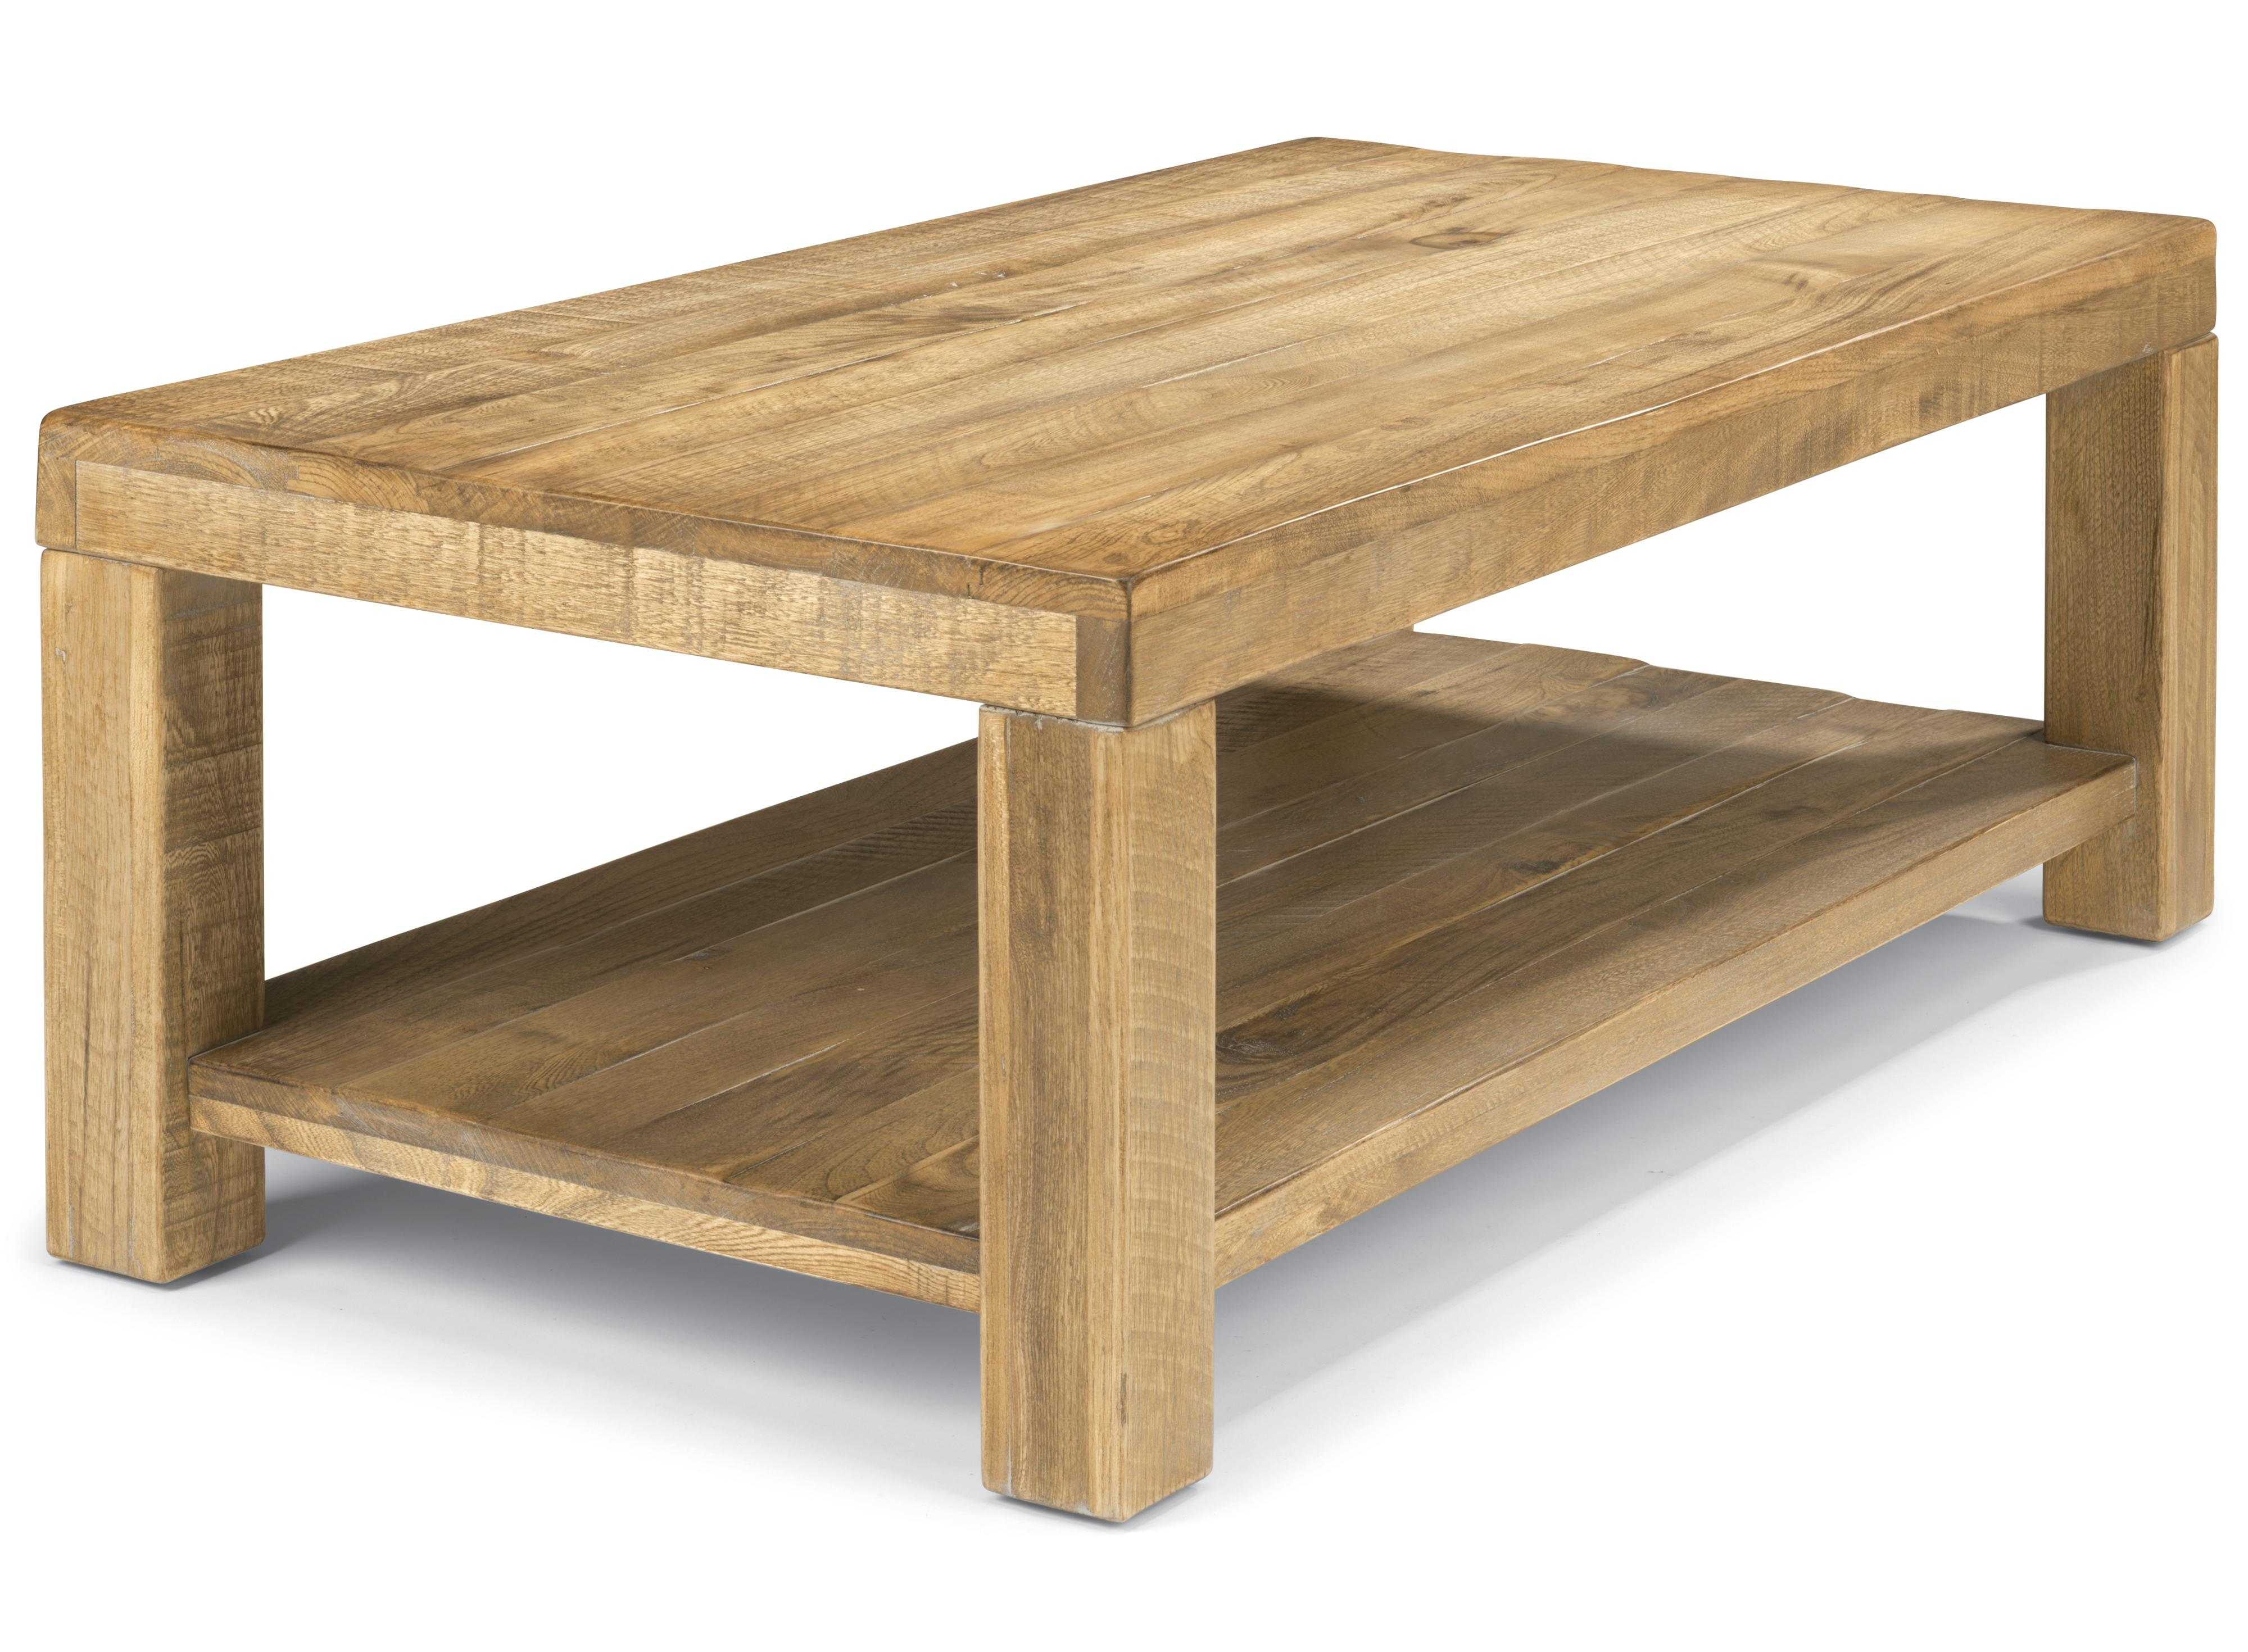 Flexsteel Sawyer Rectangular Cocktail Table with Block Legs